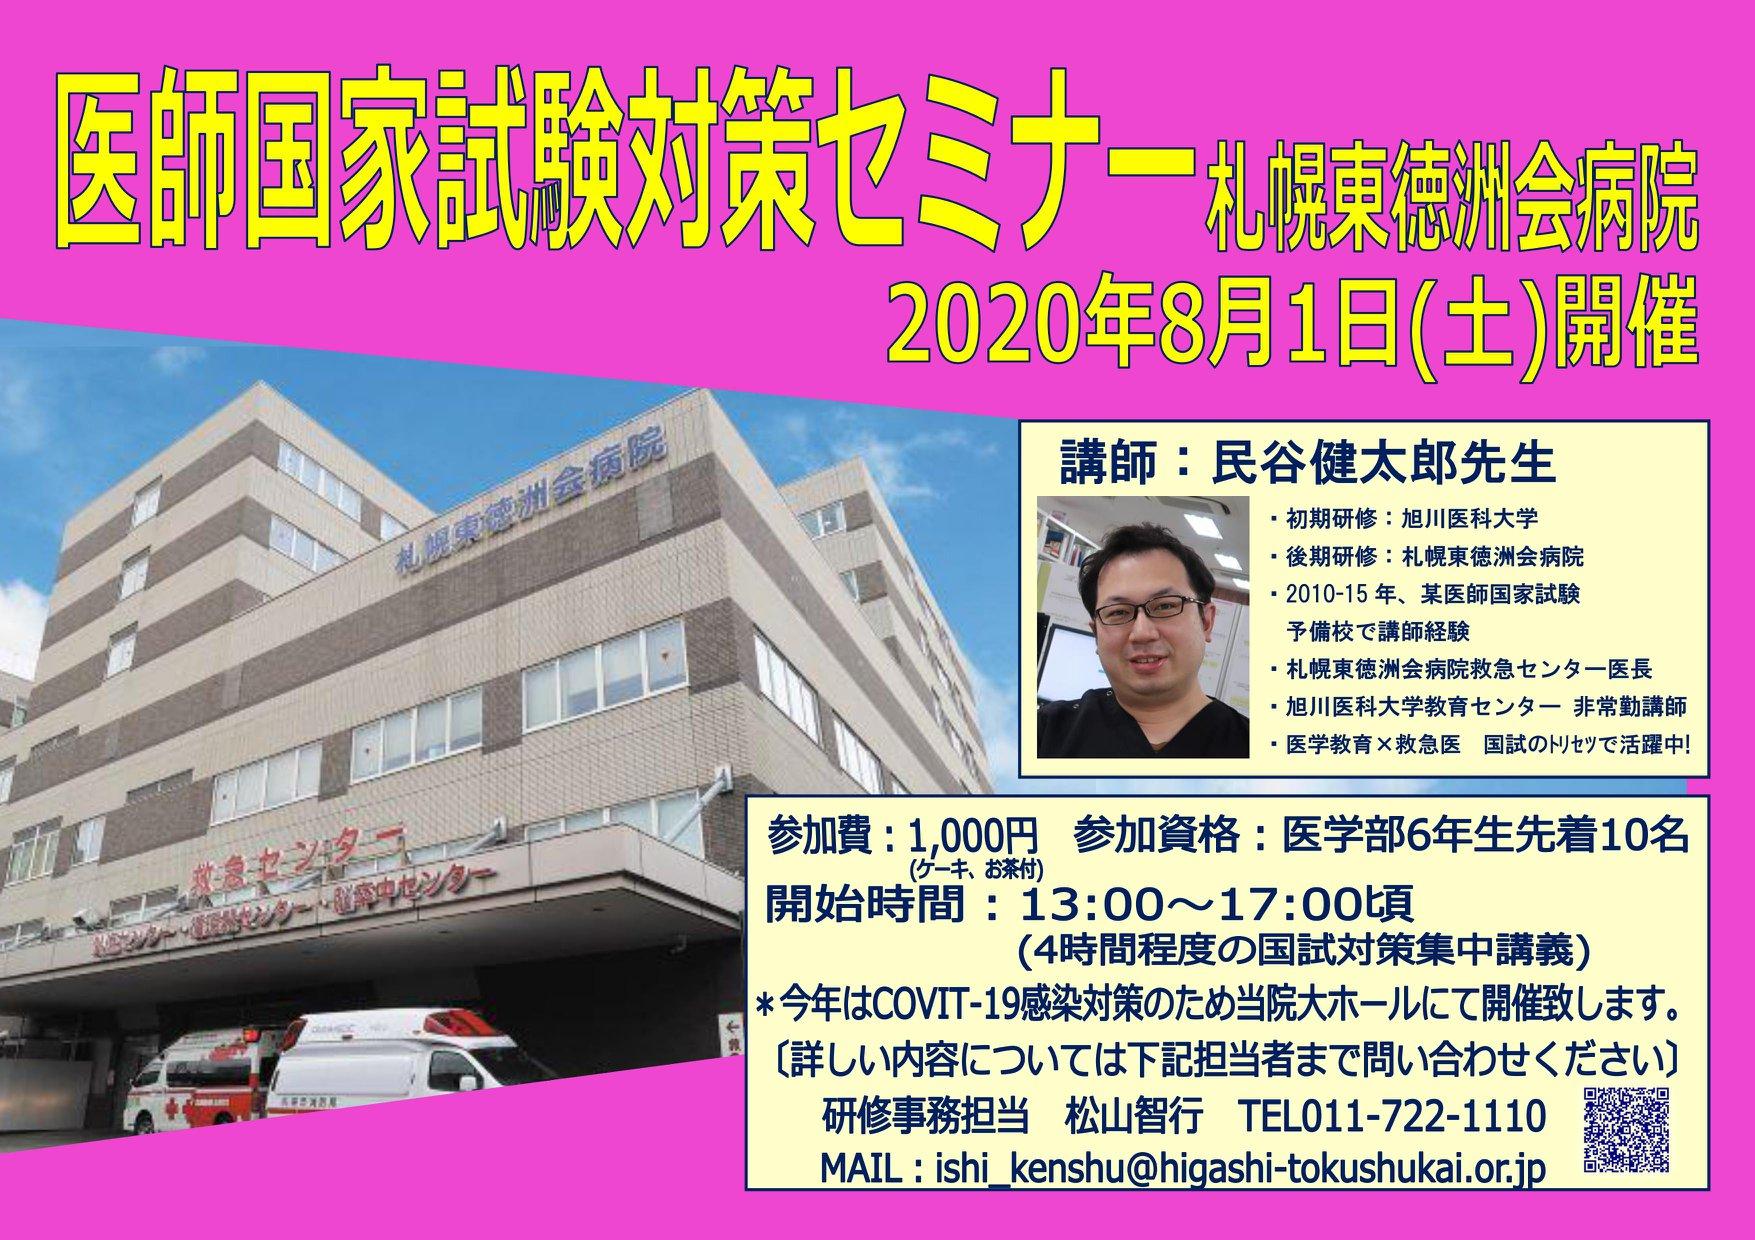 http://blog.higashi-tokushukai.or.jp/ydblog/106596916_2567016310229442_850449248060107460_o.jpg